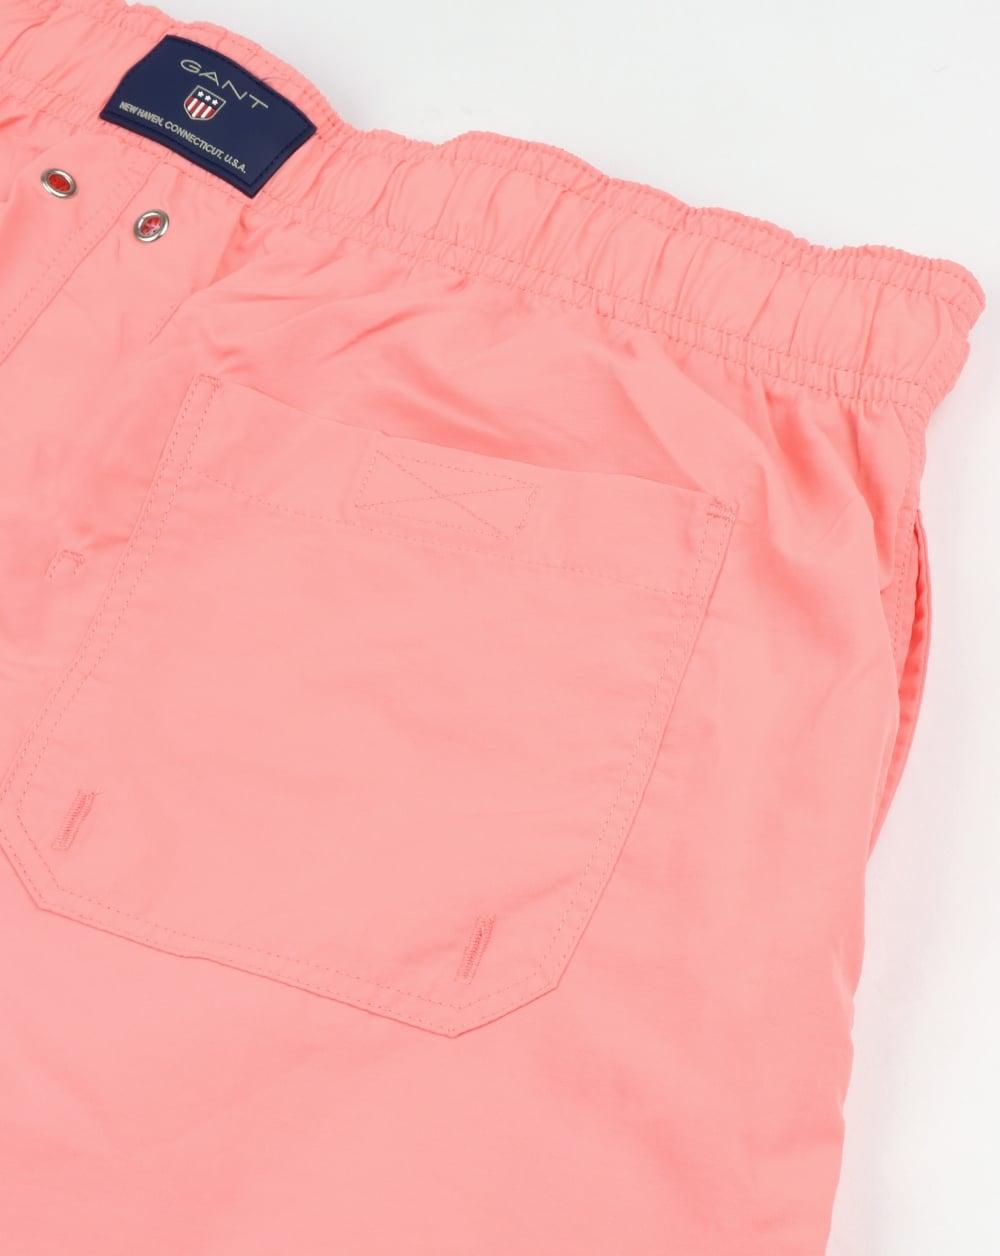 Basic Swim Shorts - Strawberry Pink GANT 2018 New Cheap Price Inexpensive For Sale Sale Fake Marketable sLPNK